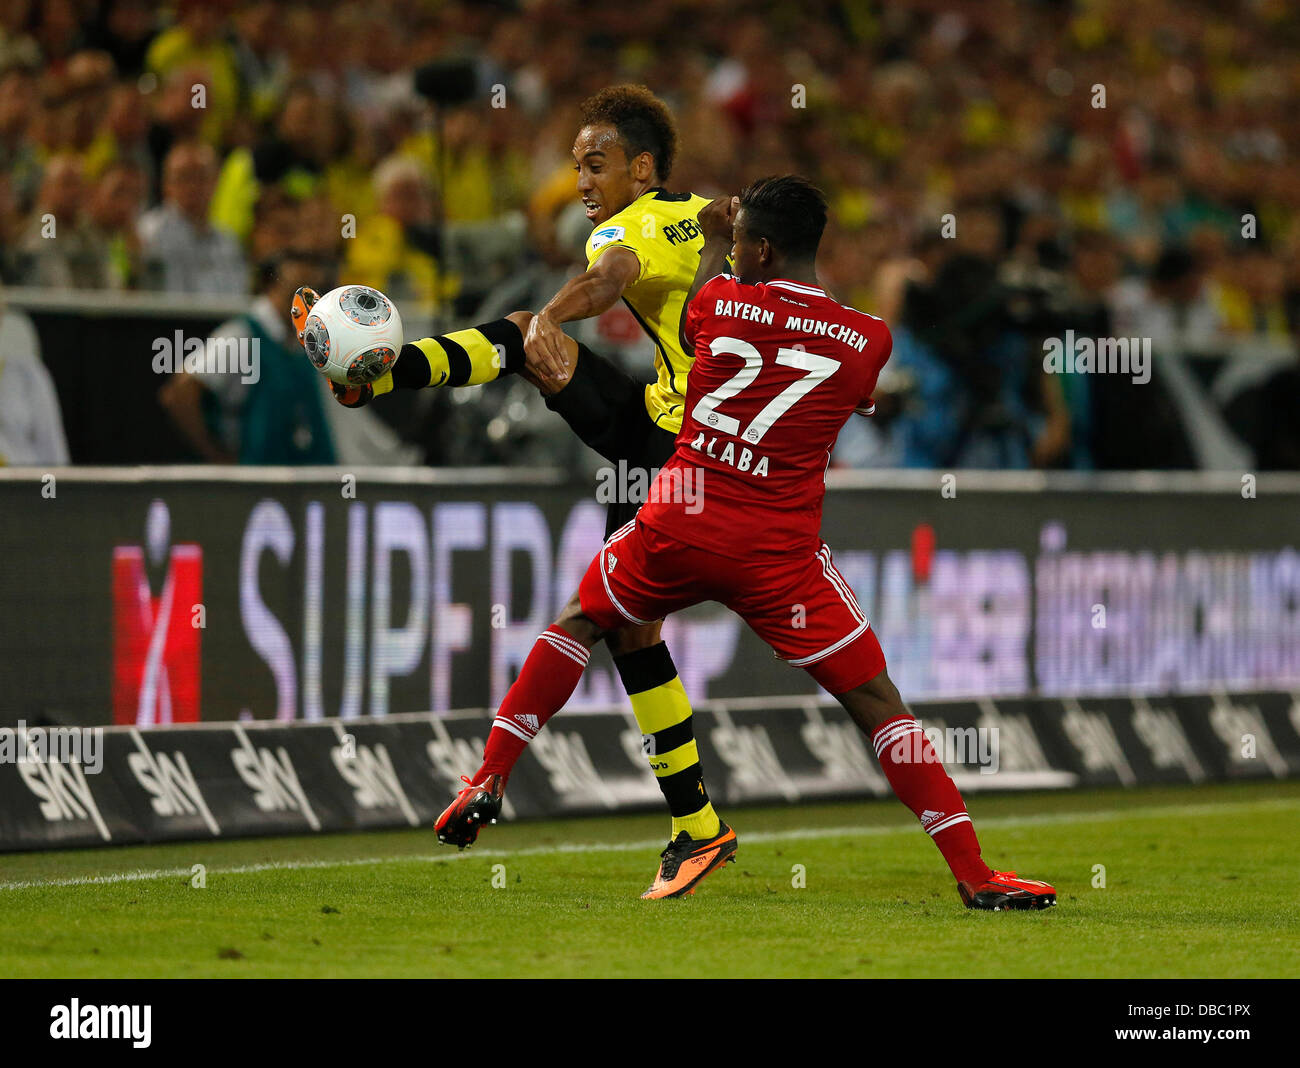 Fußball, Bundesliga, DFL-SuperCup am 27.07.2013 im Signal-Iduna Park in Dortmund Borussia Dortmund - FC Bayern - Stock Image